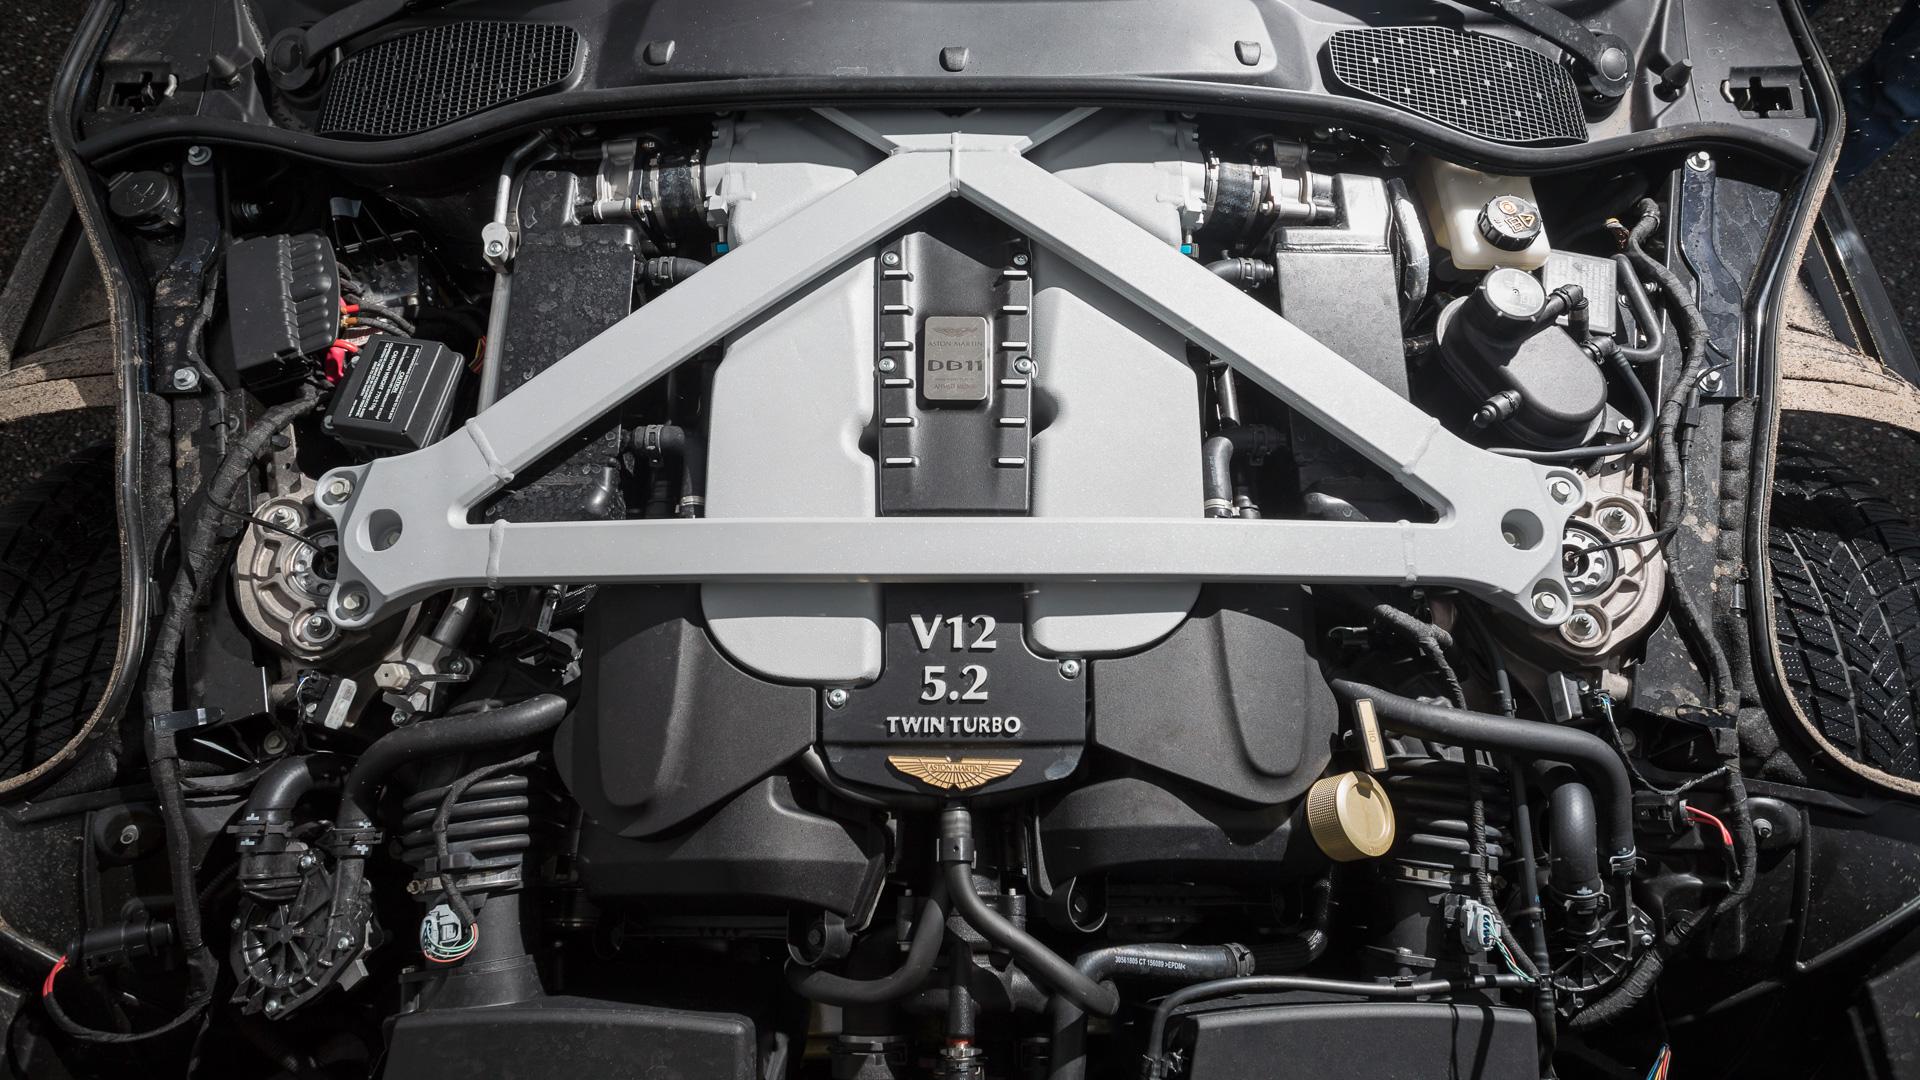 Тест-драйв мечты Джеймса Бонда: Aston Martin DB11. Фото 3